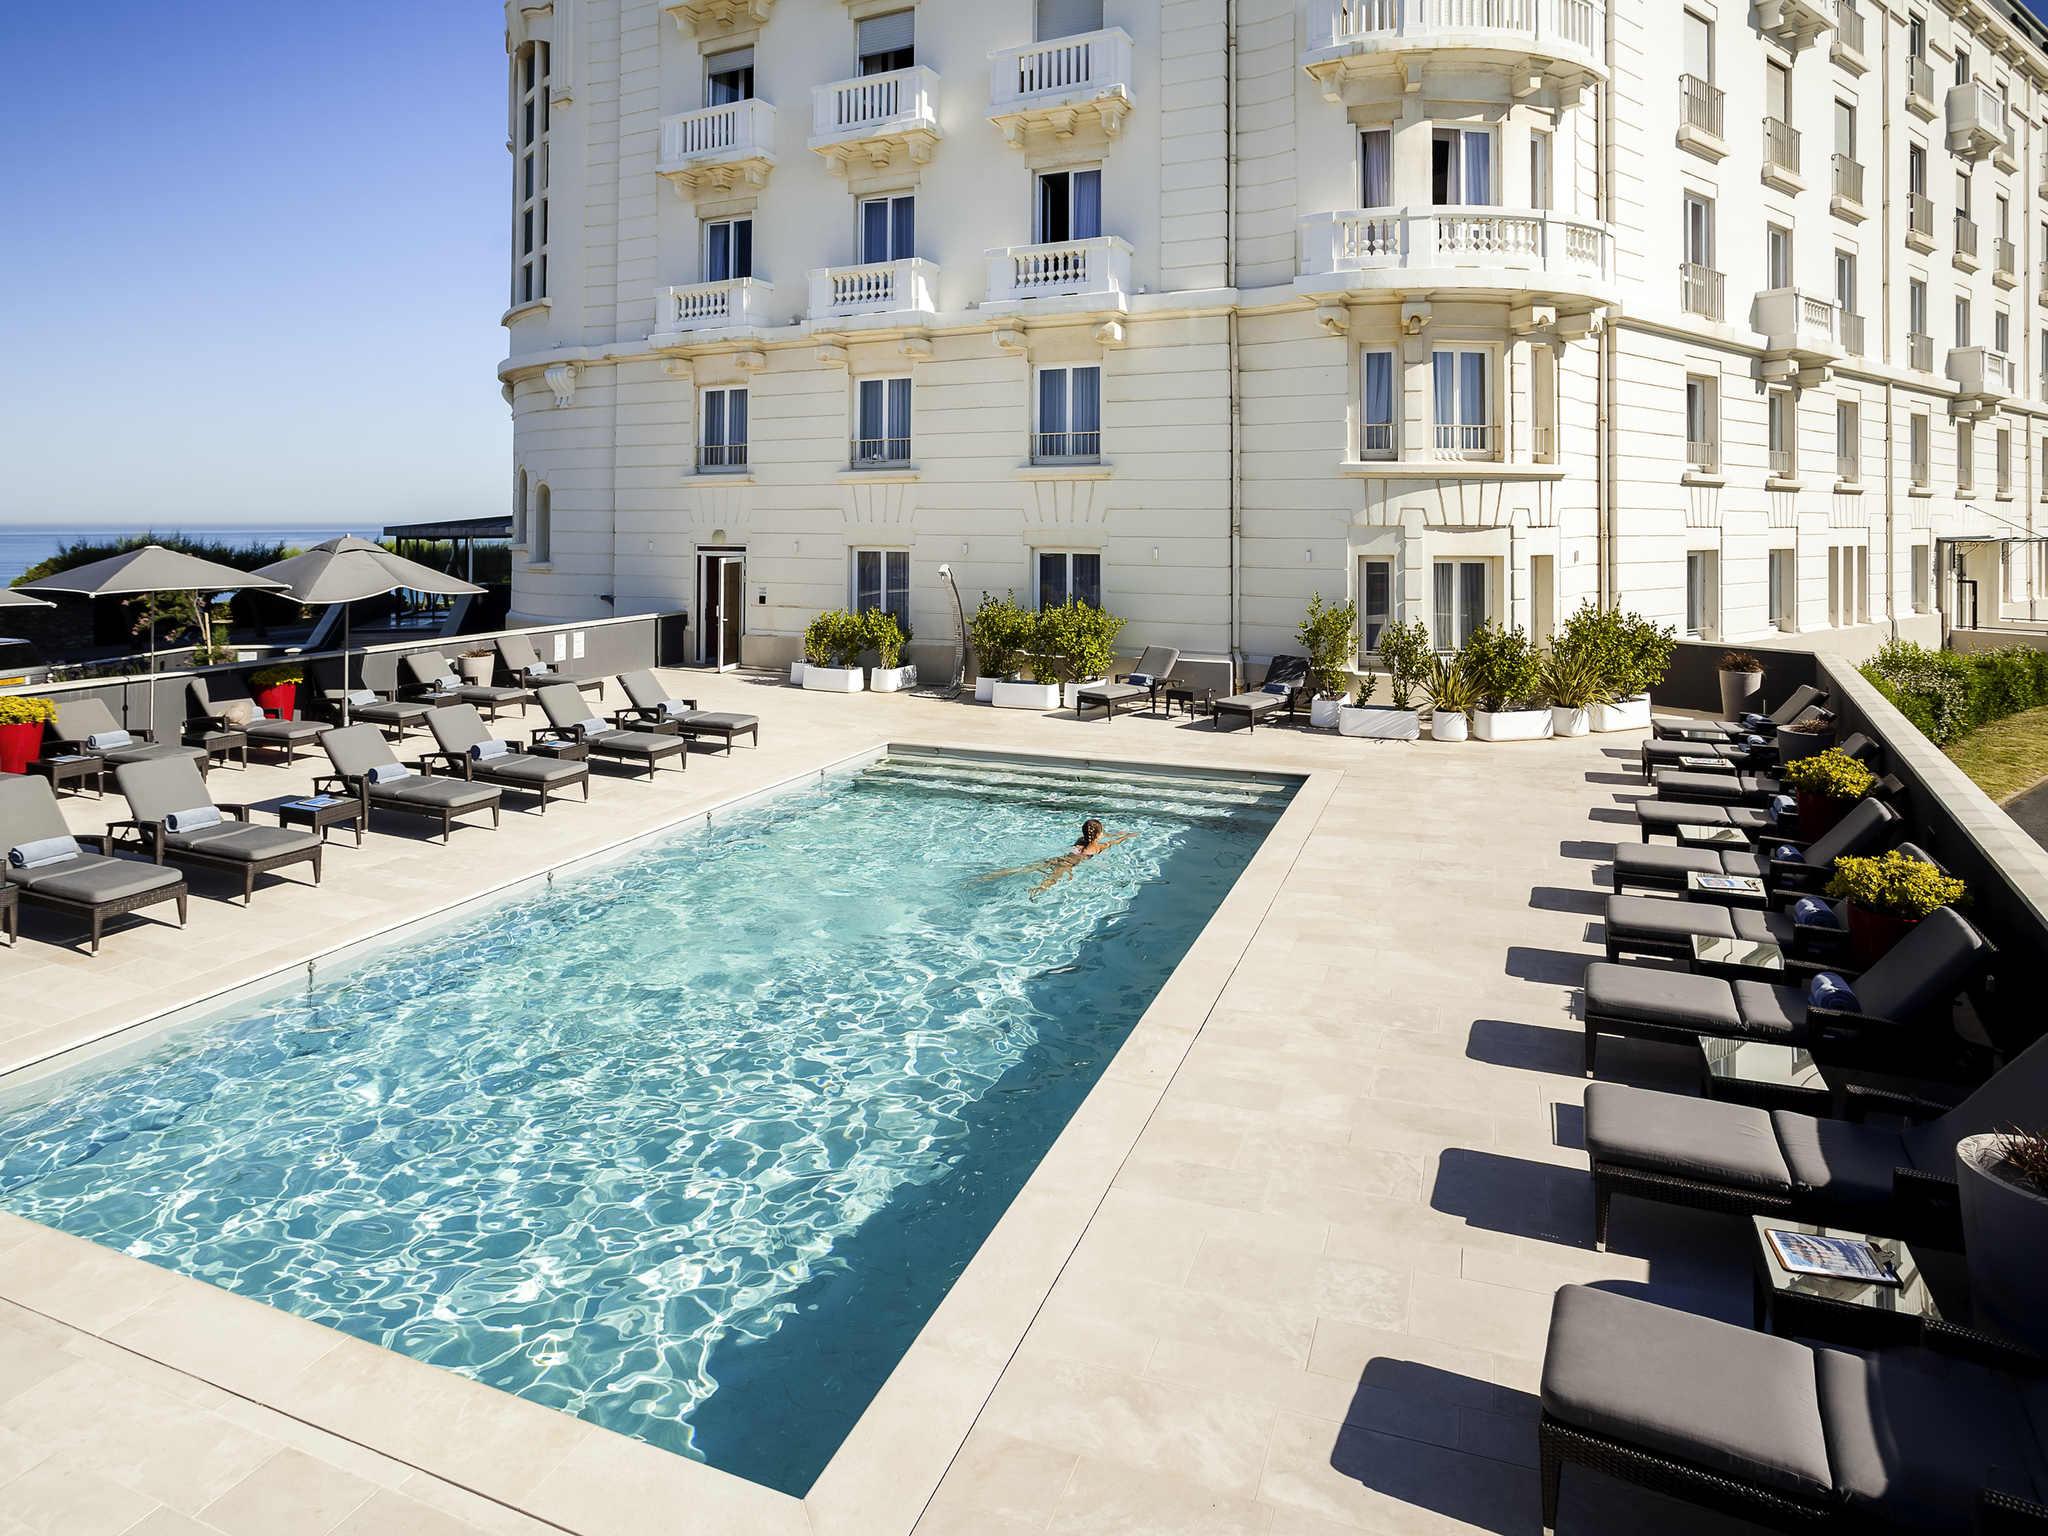 Hotel - Le Régina Biarritz Hôtel & Spa - MGallery by Sofitel